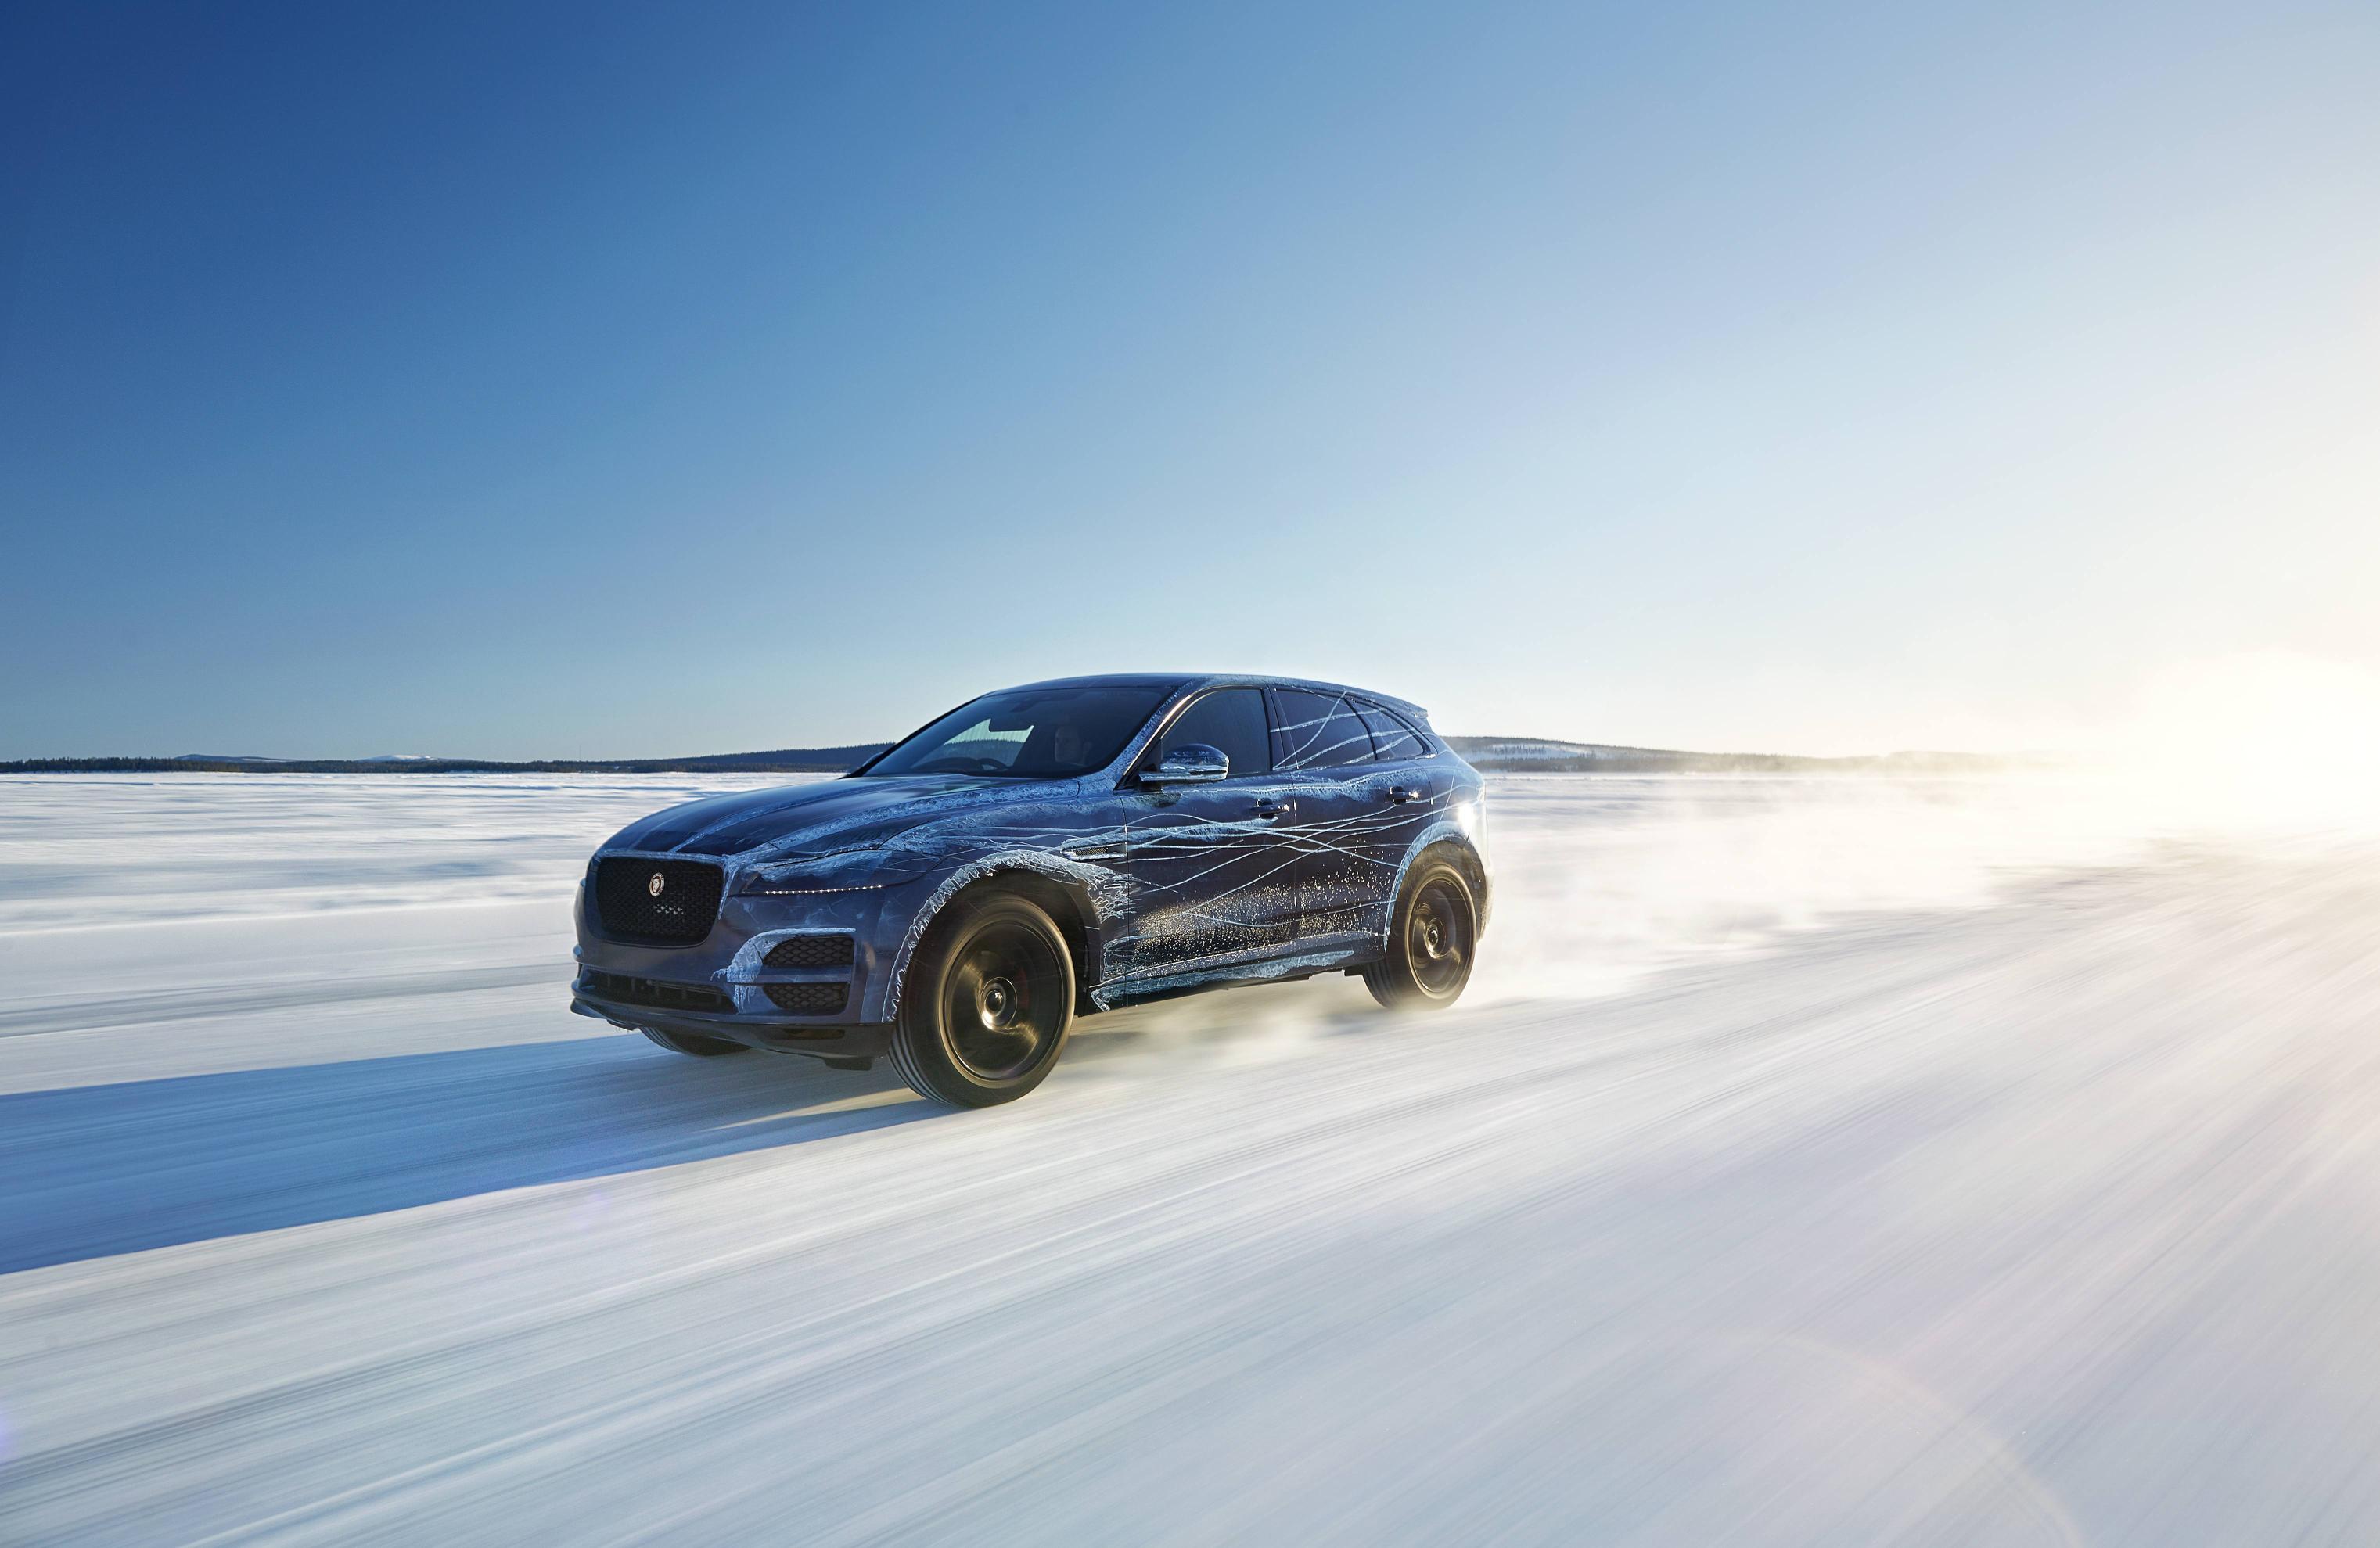 autonews speed nj com debuts myautoworld jaguar top new the at